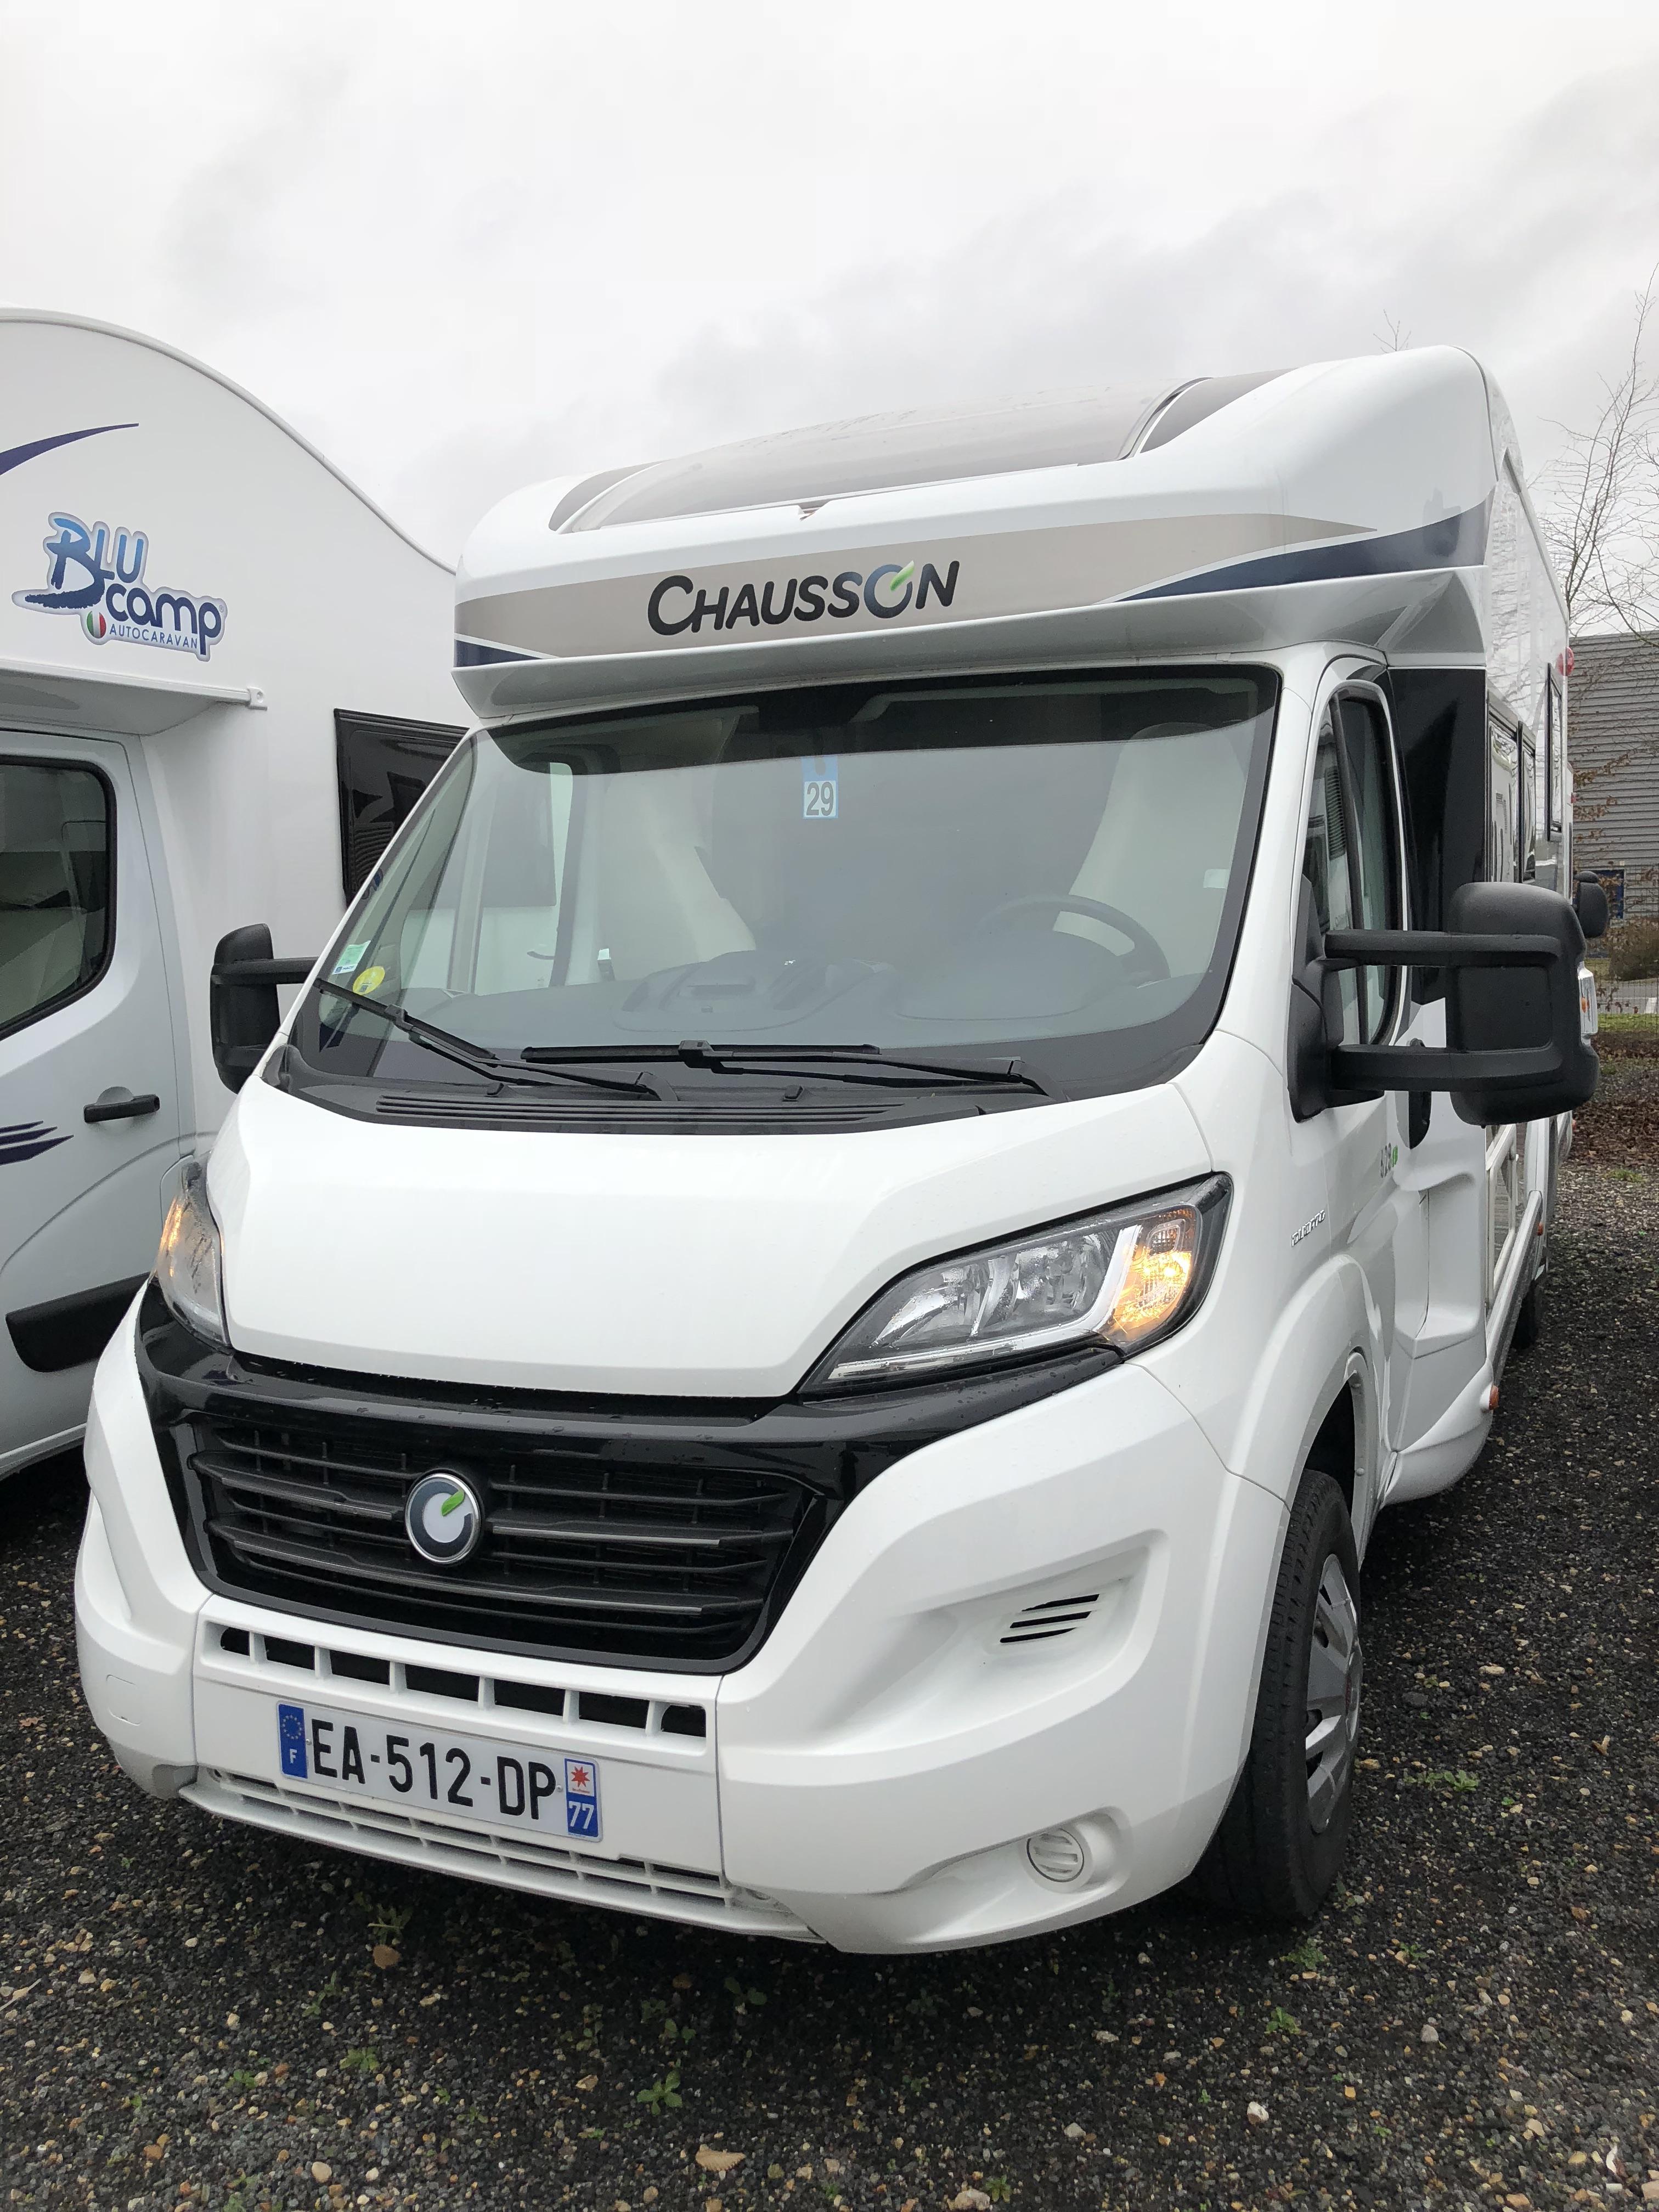 chausson 628 eb occasion porteur fiat ducato 2 3 130 cv camping car vendre en seine et marne. Black Bedroom Furniture Sets. Home Design Ideas